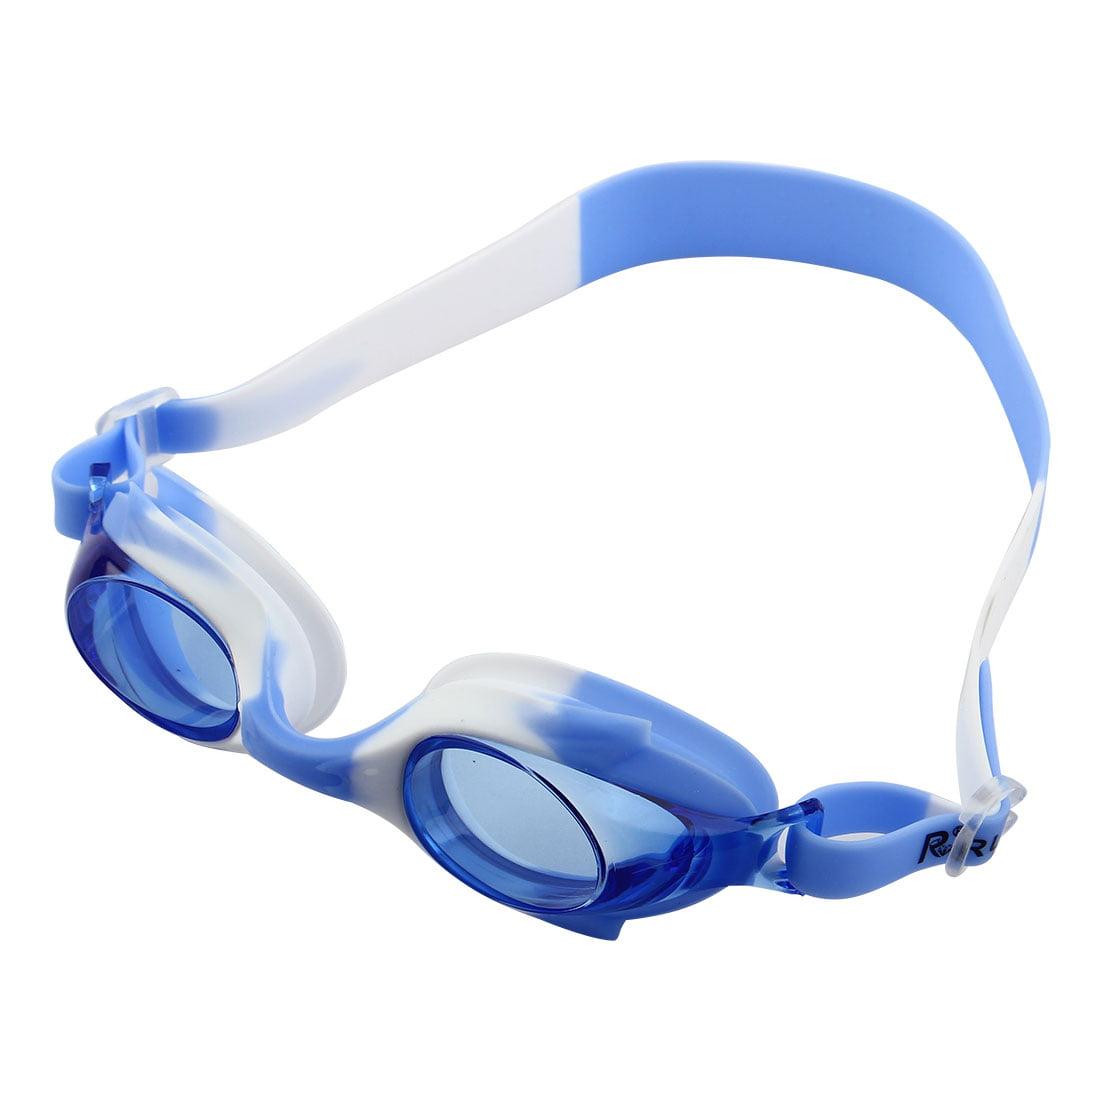 Silicone Belt Clear Vision Anti Fog Swim Goggles Glasses Blue White for Children by Unique-Bargains